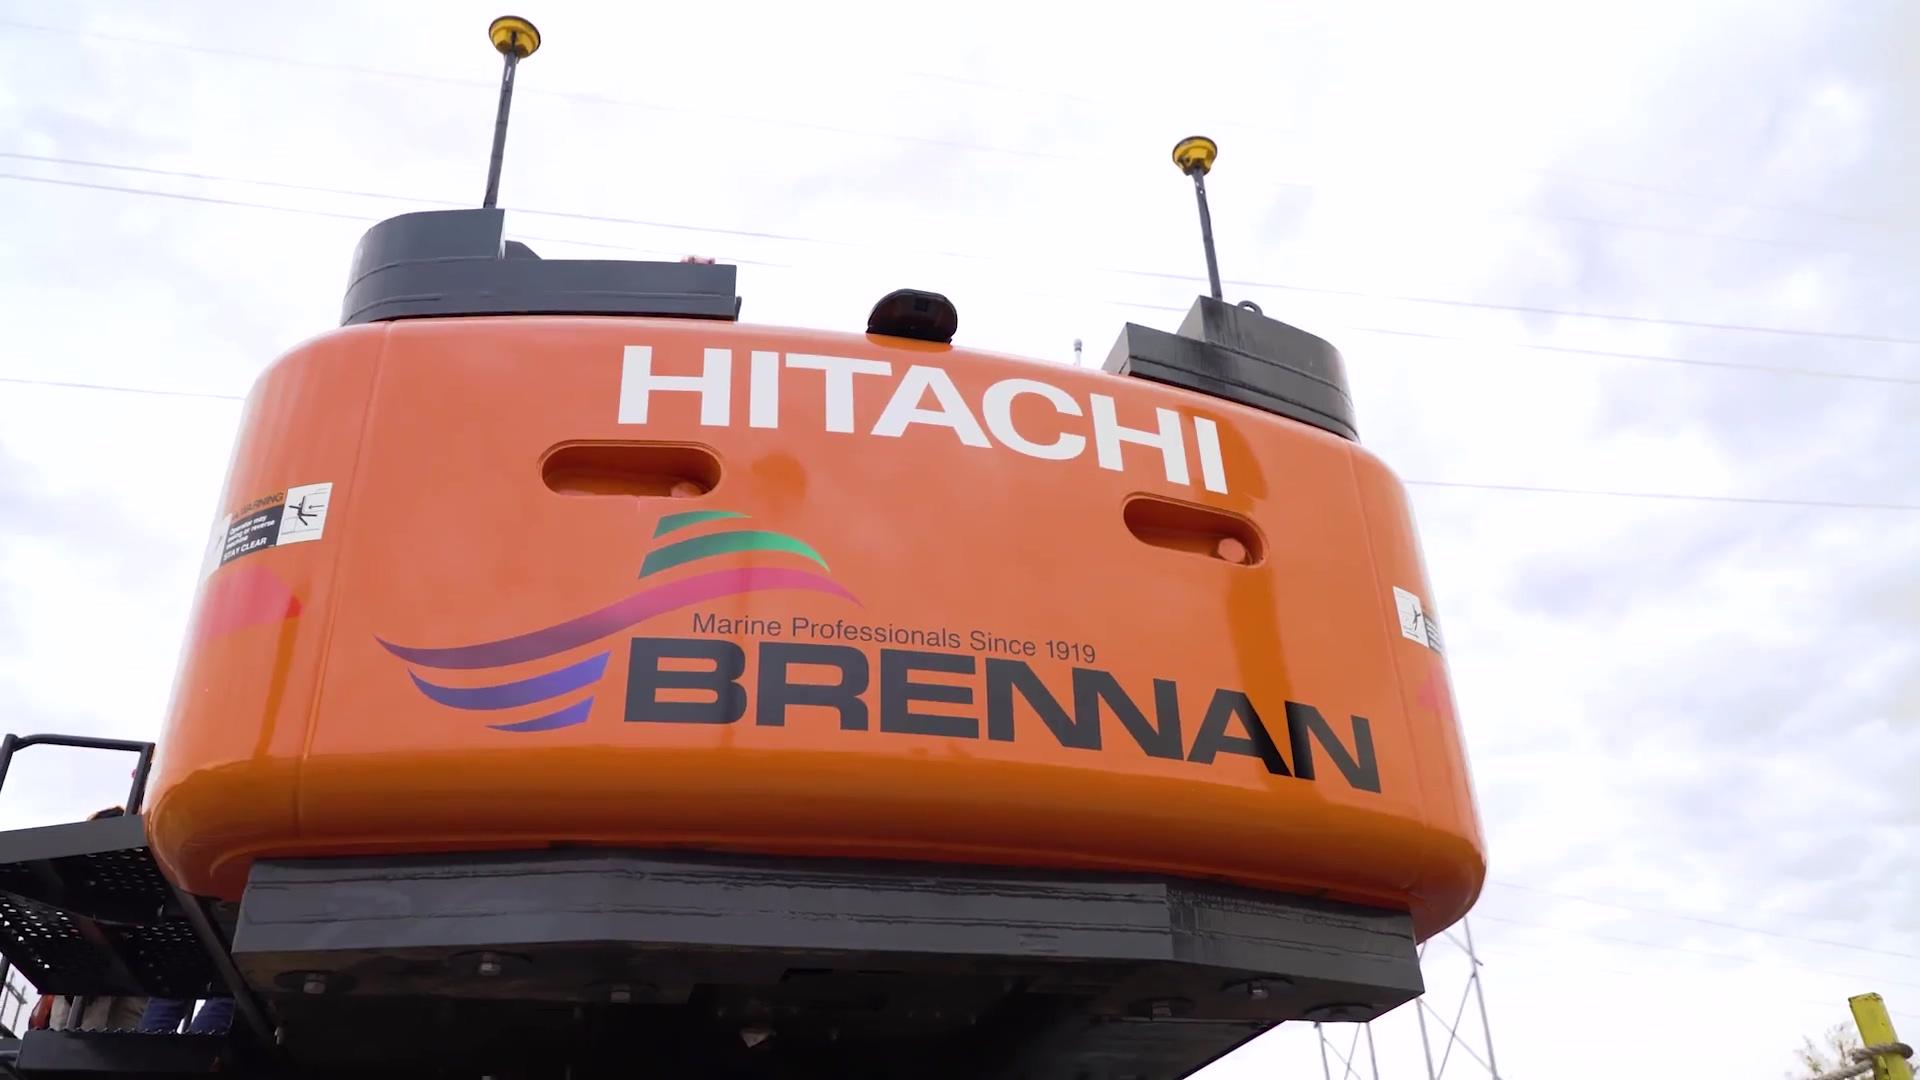 2019 Hitachi Breakout-Video-Brennan 1080p